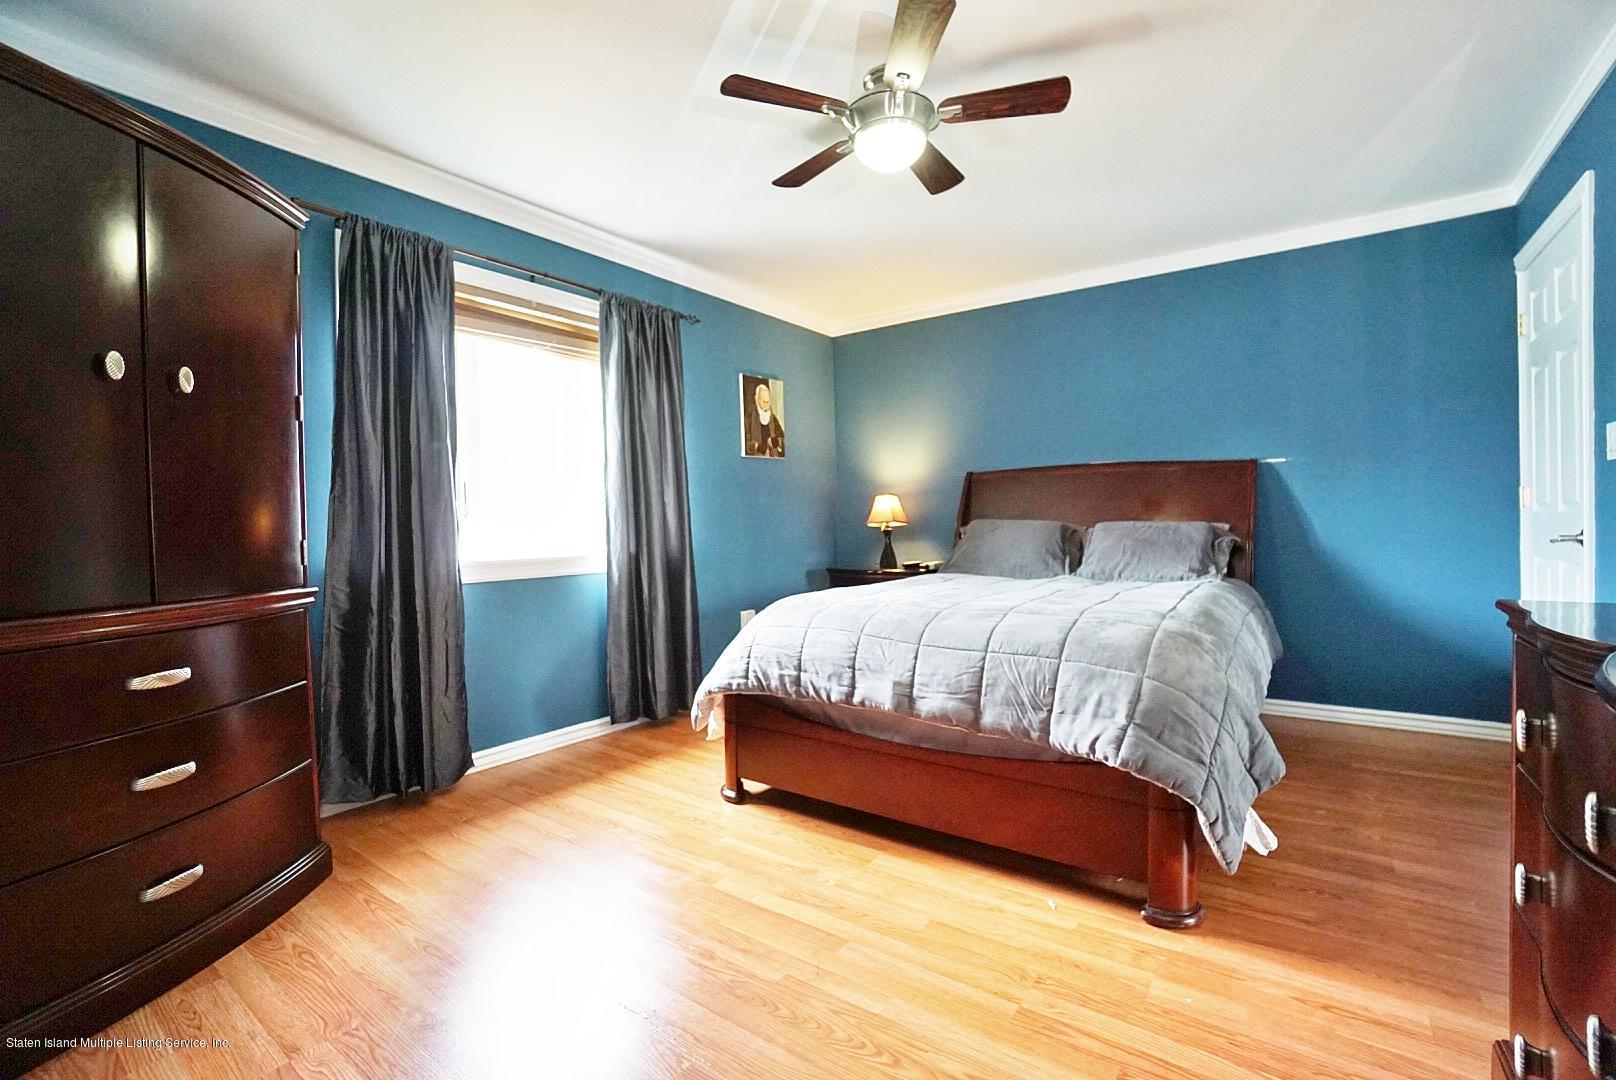 Single Family - Detached 67 Marvin Road  Staten Island, NY 10309, MLS-1128691-16